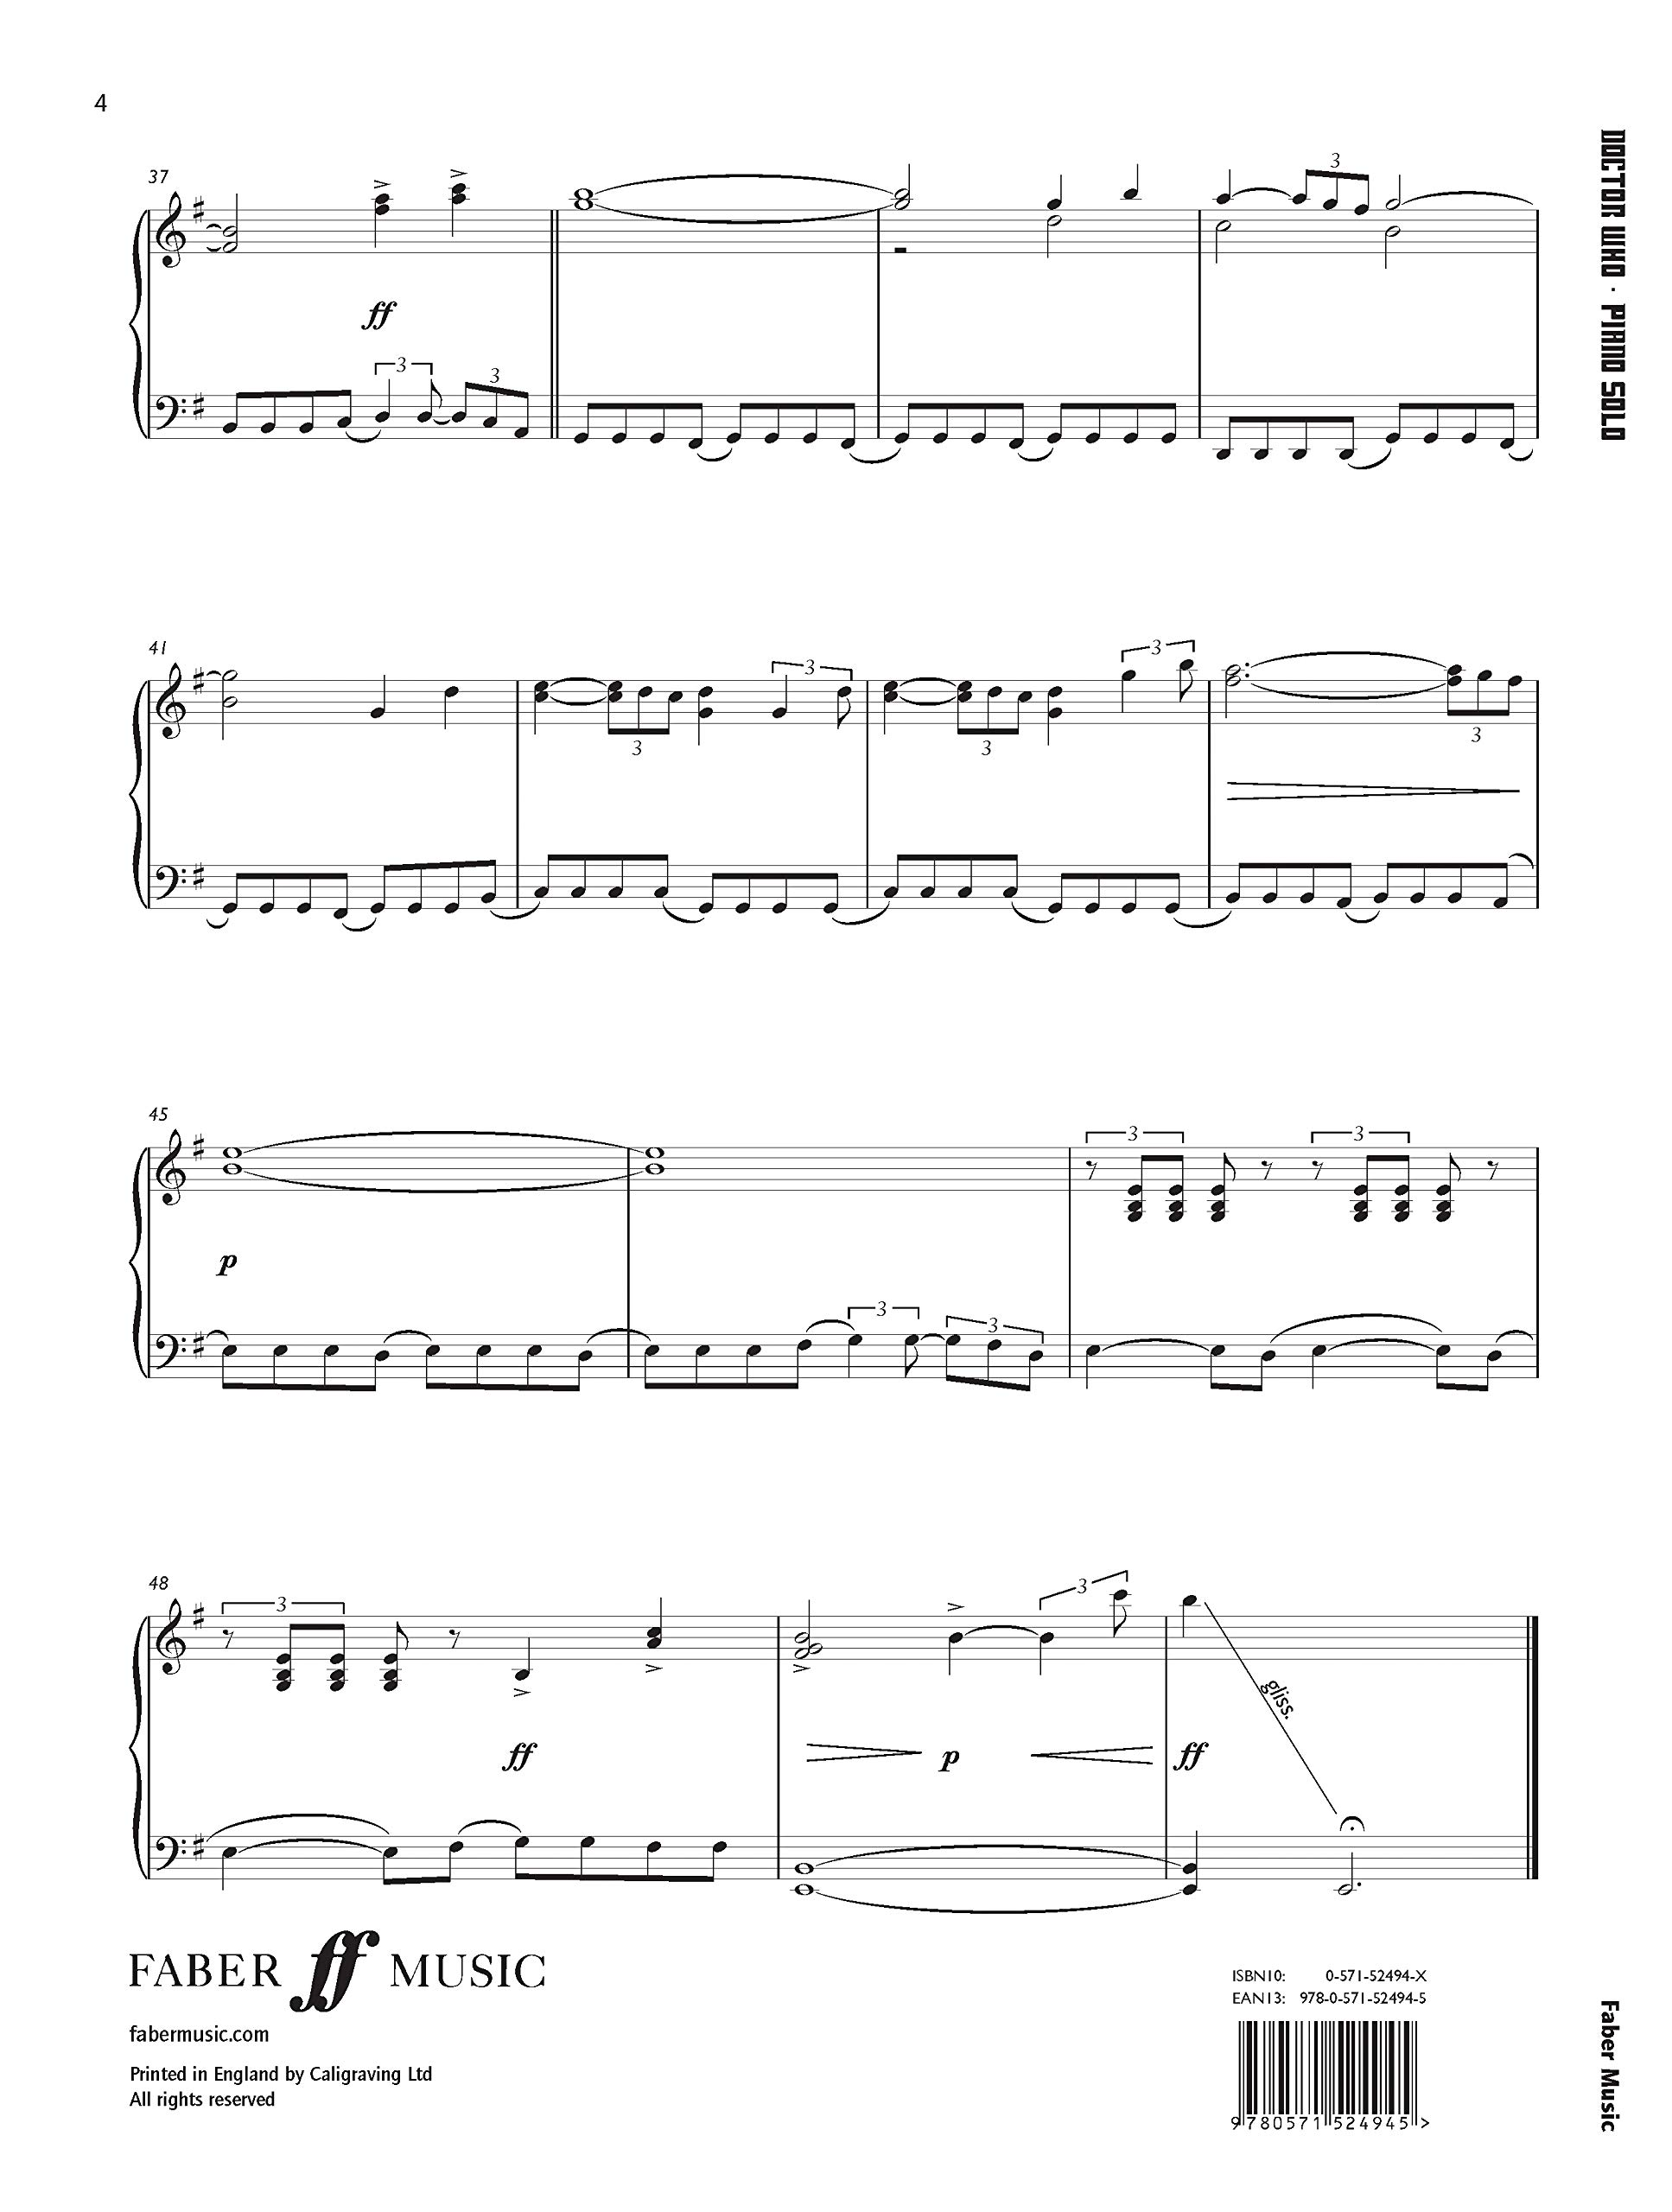 Doctor Who Theme: Piano Solo (Faber Edition): Amazon.es ...